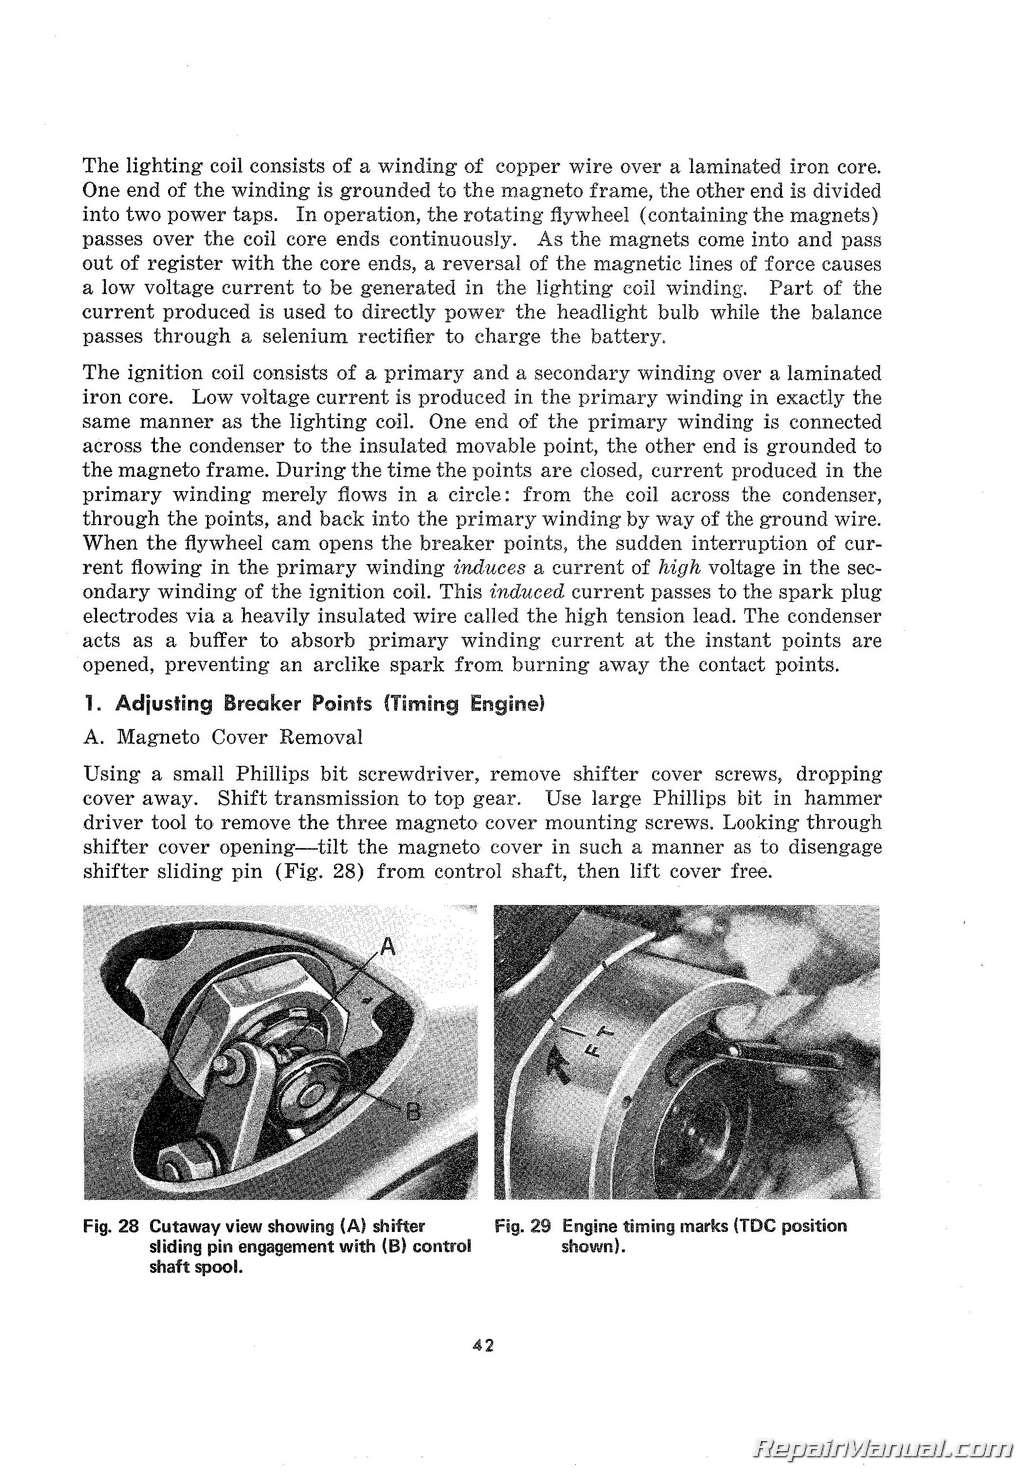 1964-1967 Hodaka Ace 90 Service Manual on alpha sports wiring diagram, kasea wiring diagram, victory wiring diagram, simplex wiring diagram, husaberg wiring diagram, mercury wiring diagram, cushman wiring diagram, pagsta wiring diagram, yale wiring diagram, garelli wiring diagram, mitsubishi wiring diagram, honda wiring diagram, norton wiring diagram, mustang wiring diagram, kreidler wiring diagram, tomos wiring diagram, lifan wiring diagram, bourget wiring diagram, ace wiring diagram, kawasaki wiring diagram,